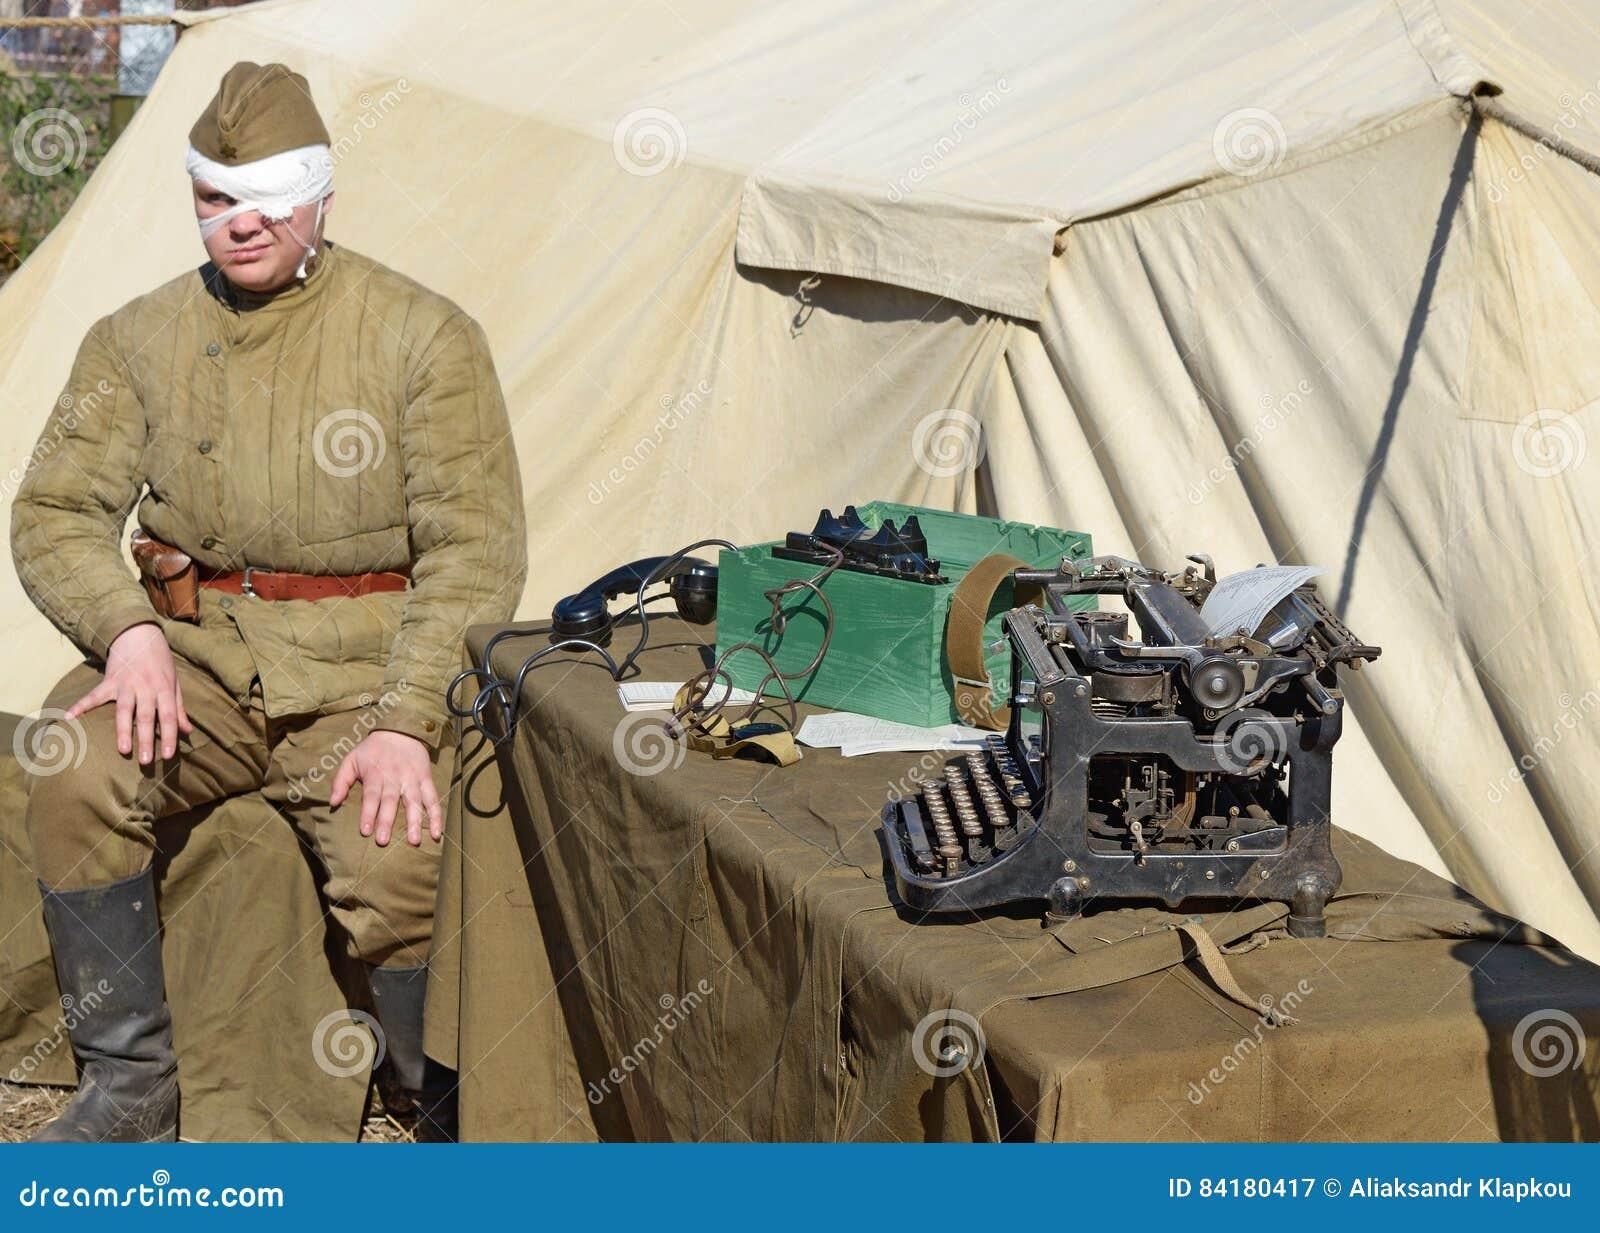 5998b4b62029f Military Paraphernalia At The Festival. Editorial Photography ...